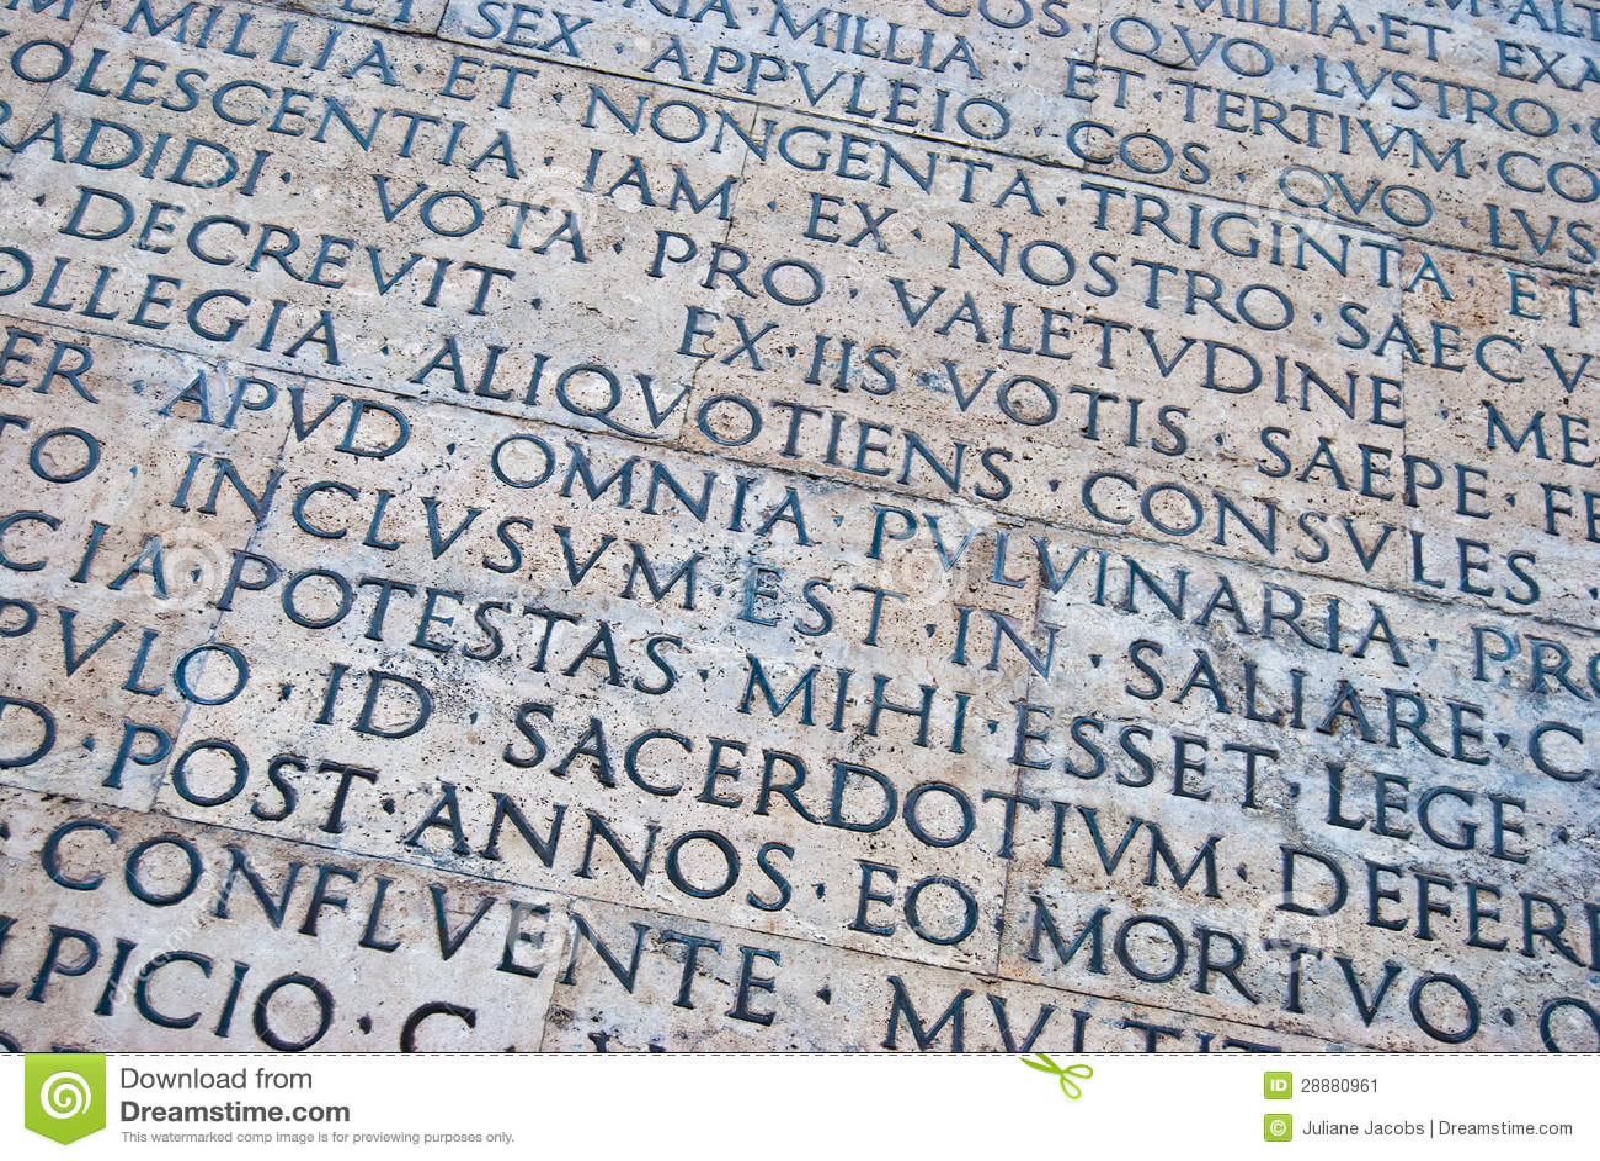 Escritura Romana Imagen de archivo - Imagen: 28880961